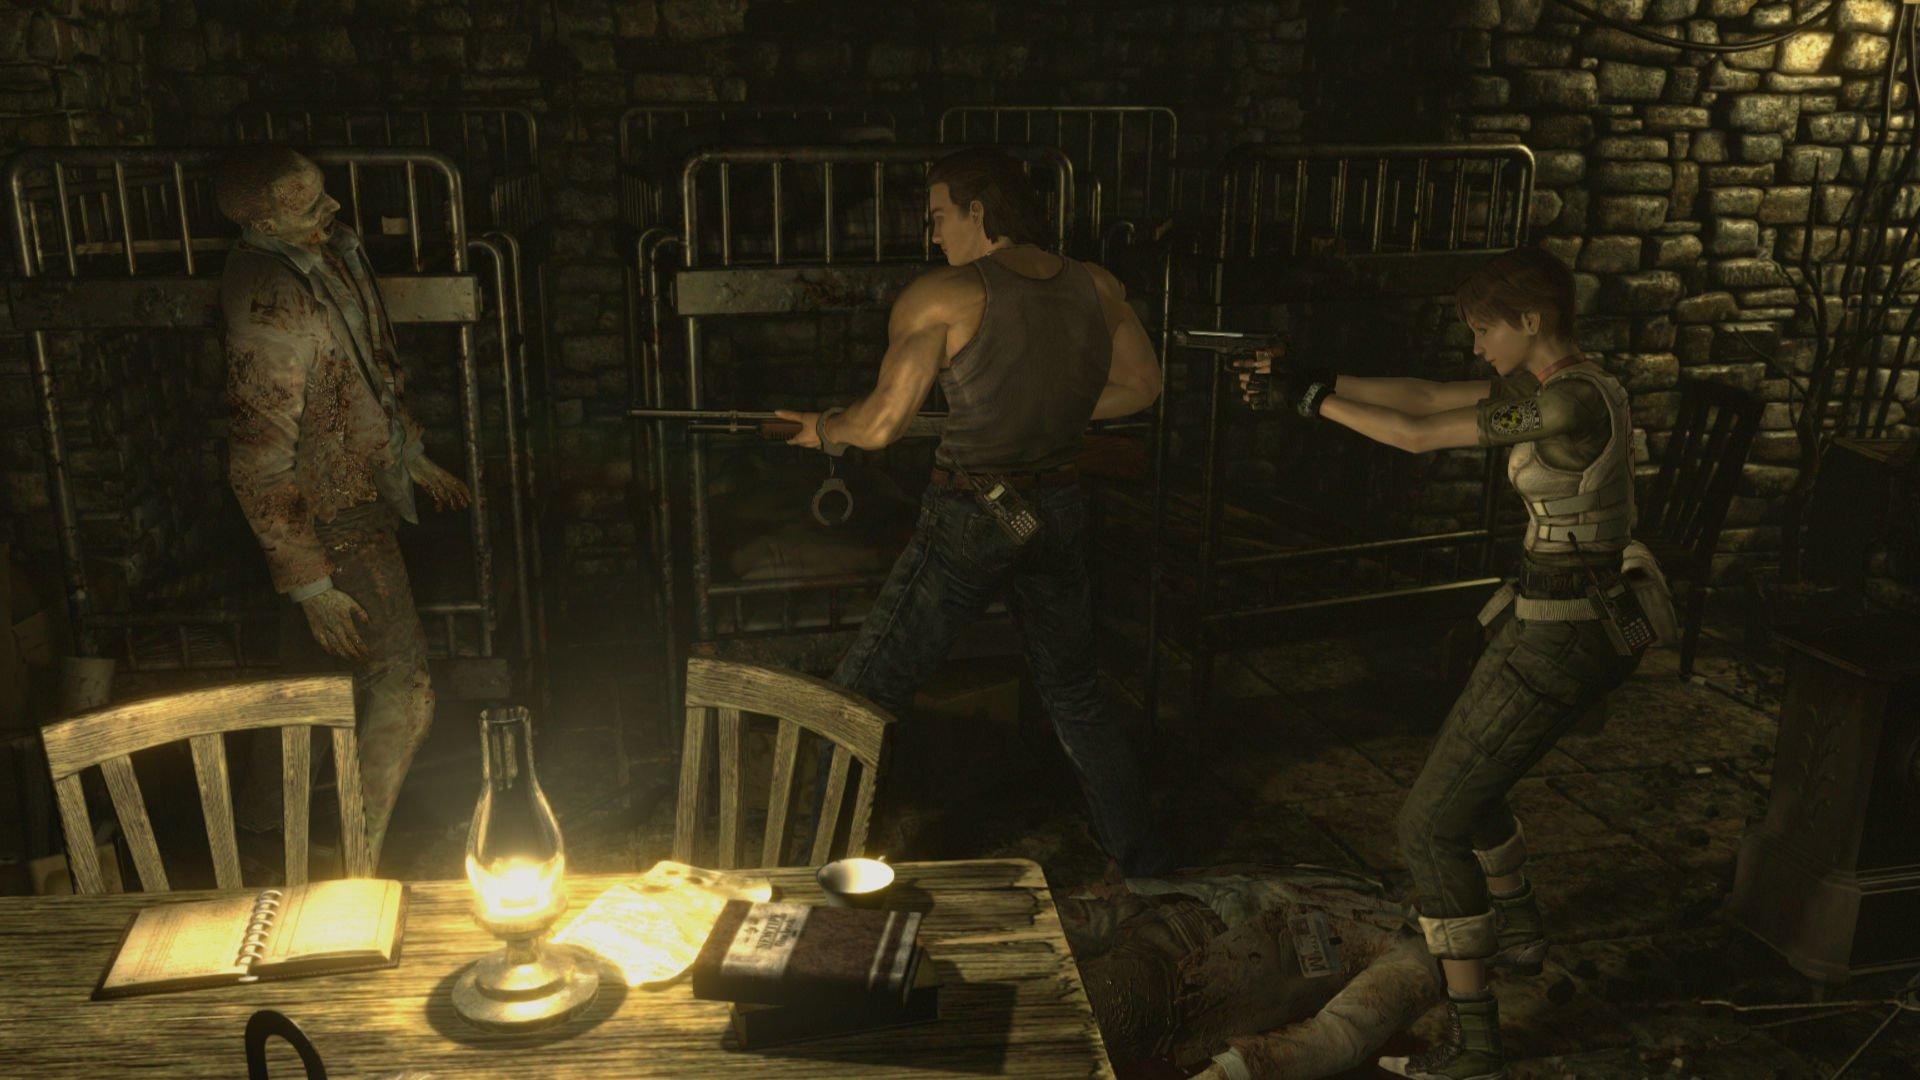 Resident evil 4 ps3 nude mod fucks image